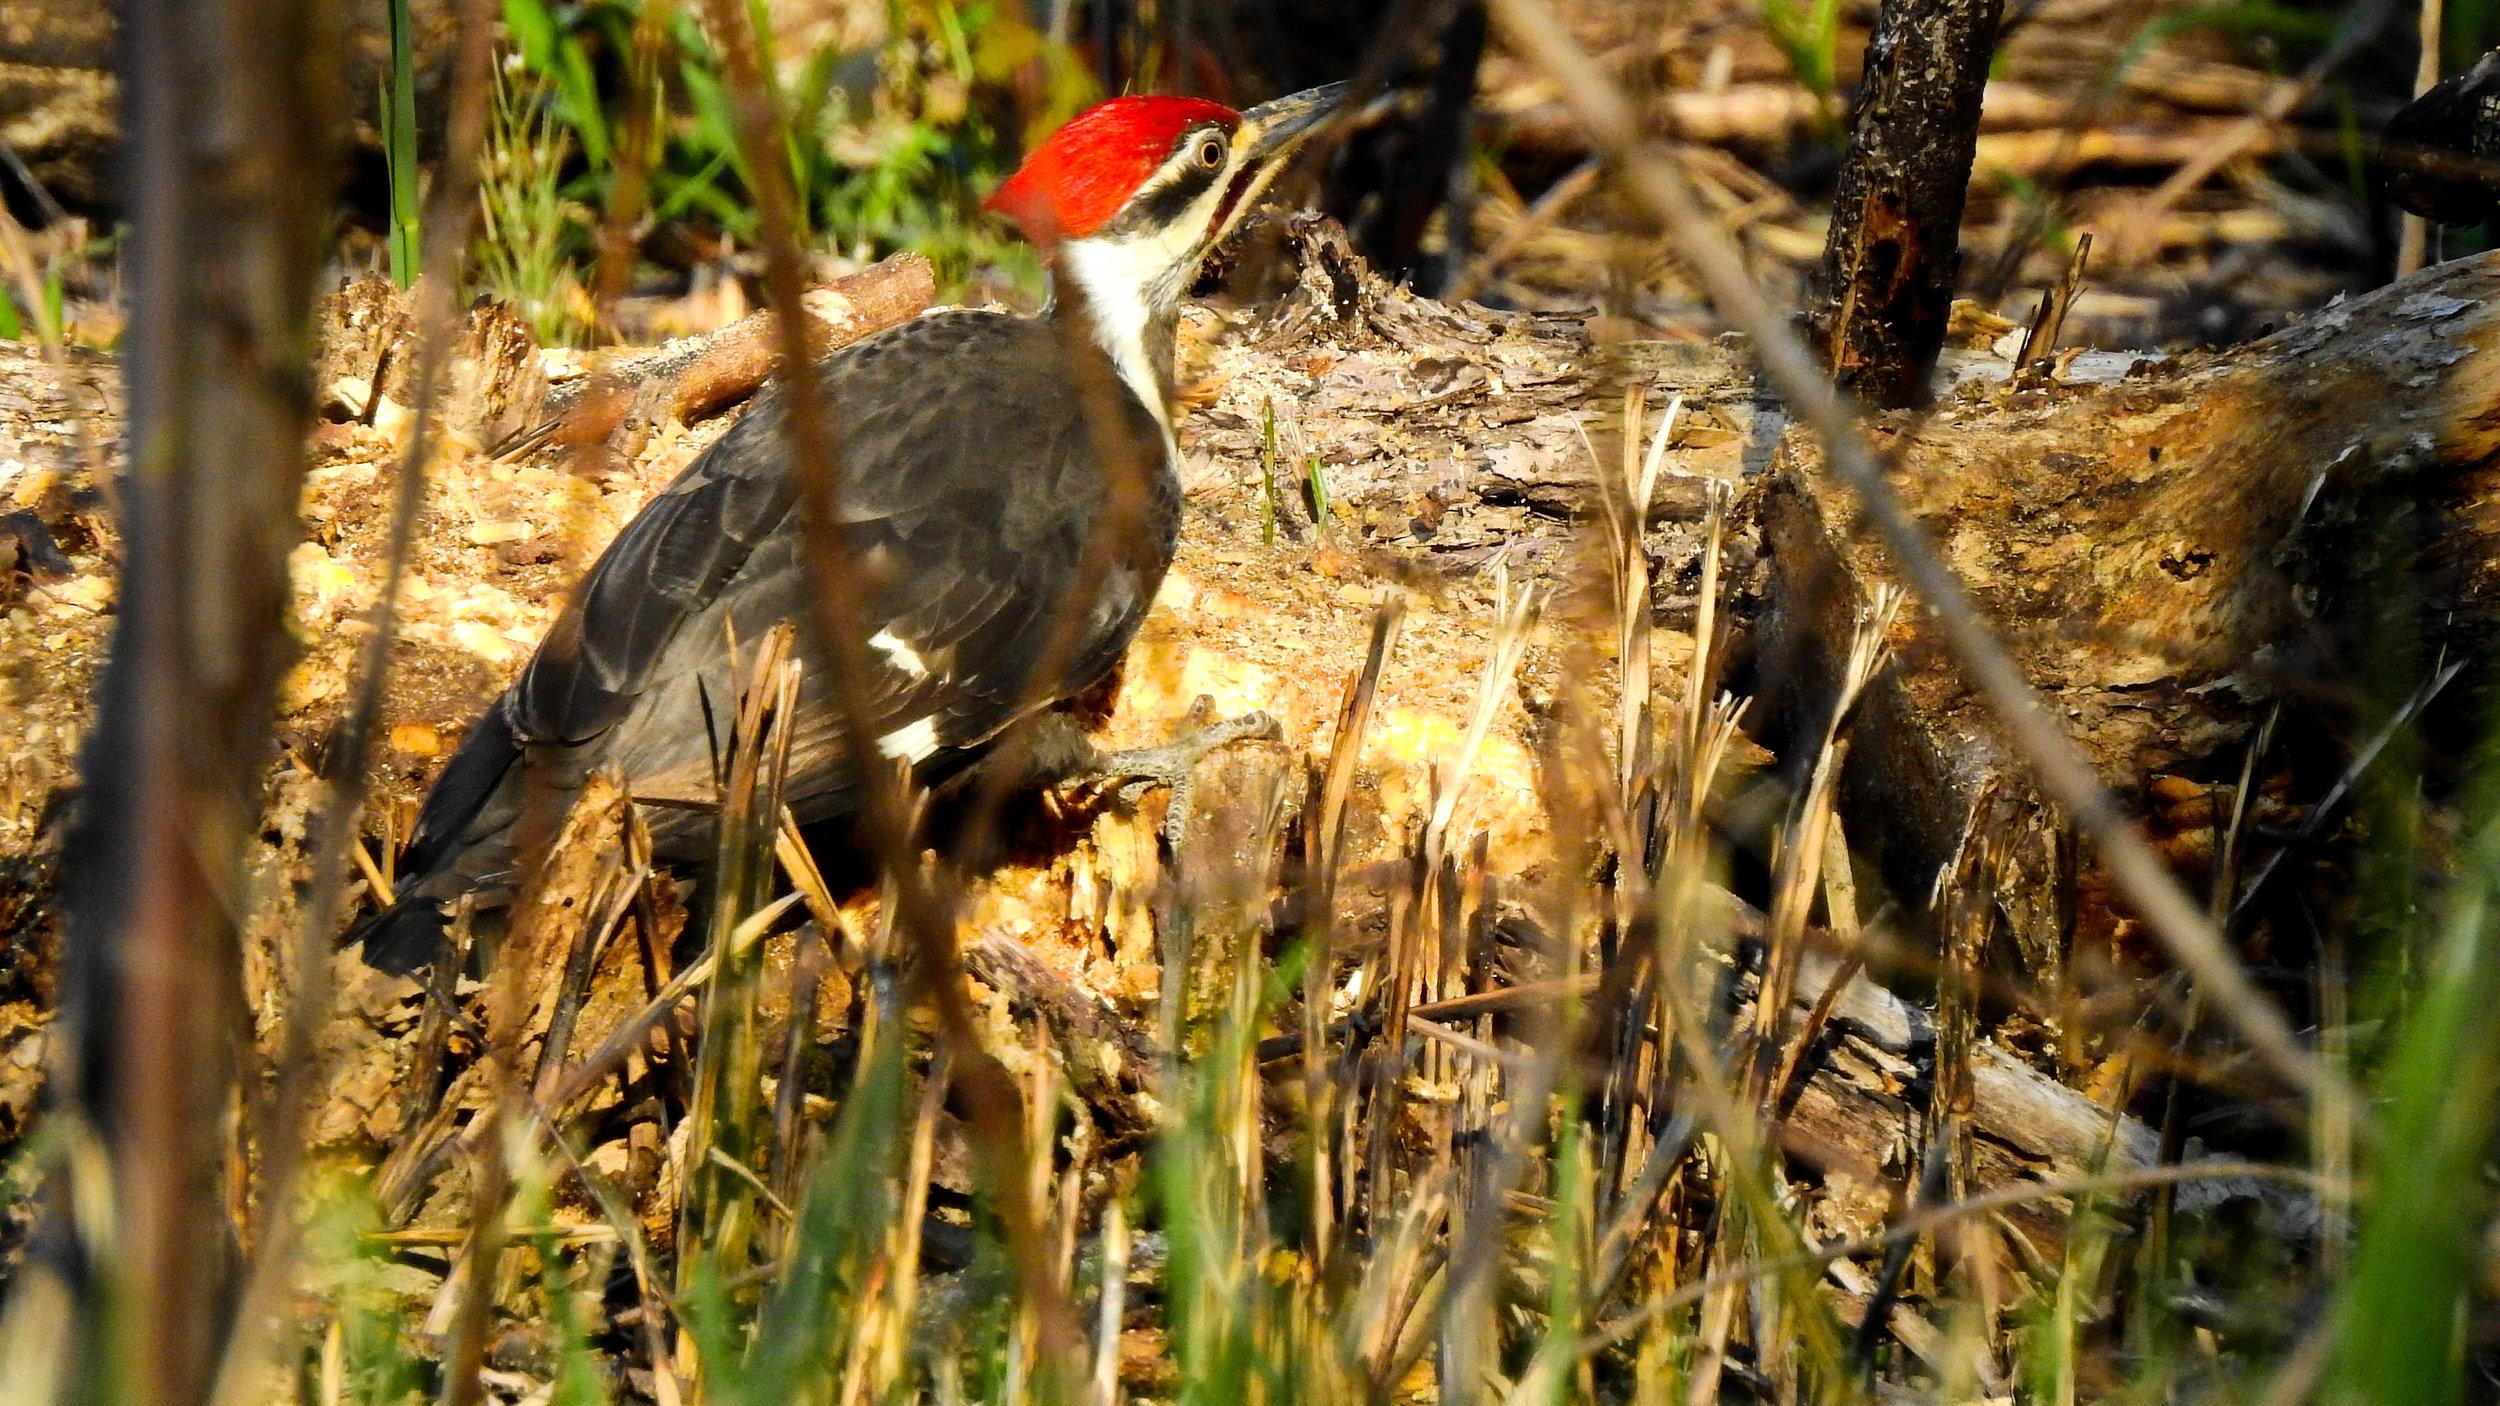 Summer Pileated Woodpecker